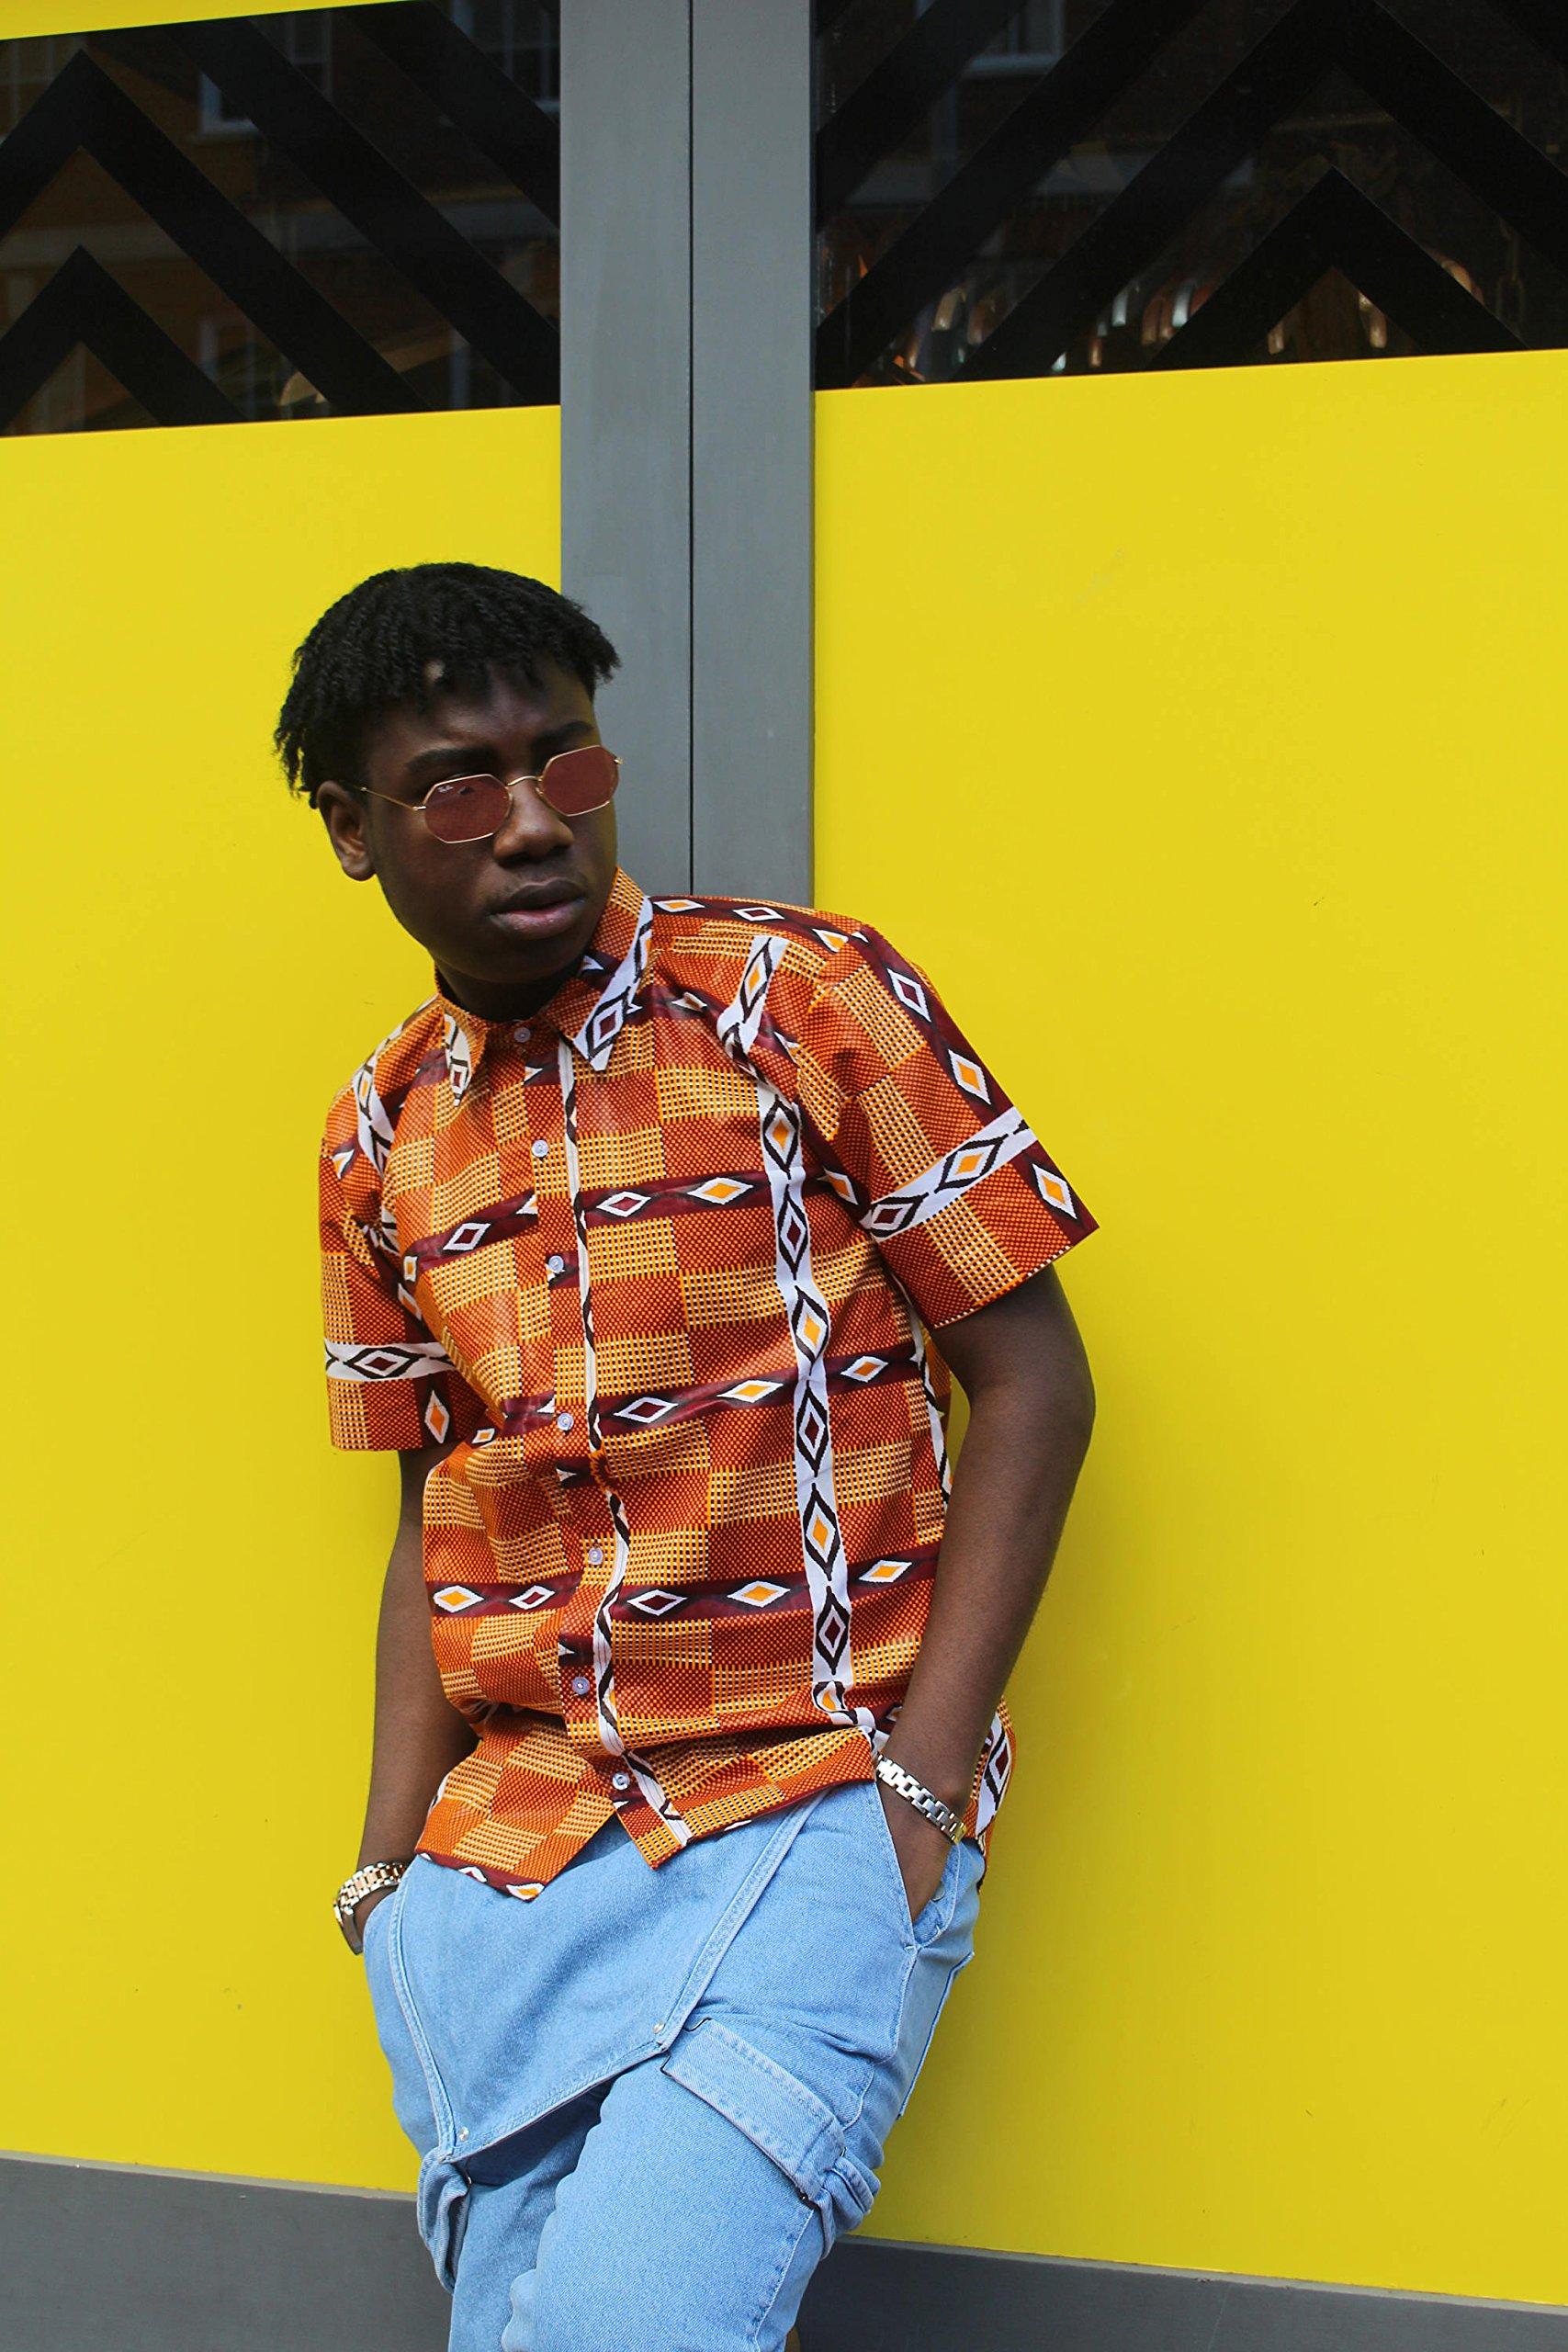 Mens African Print Shirt Kente Shirt Ankara Shirt African Top Festival Shirt African Shirt Festival Clothing Festival African Clothing